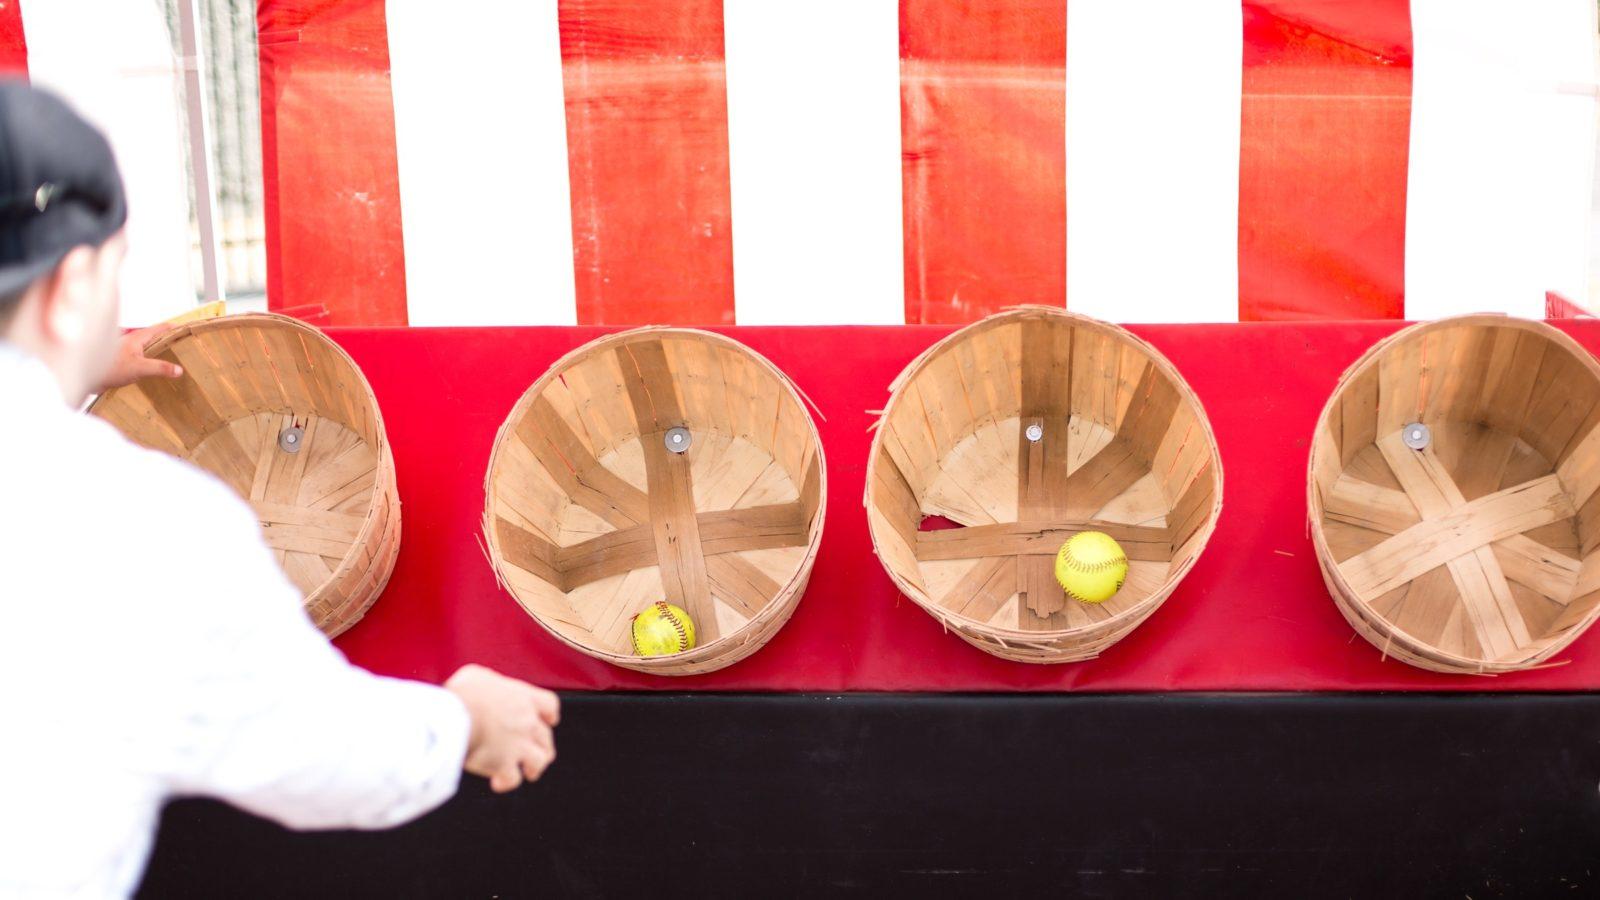 Basket Toss carnival game